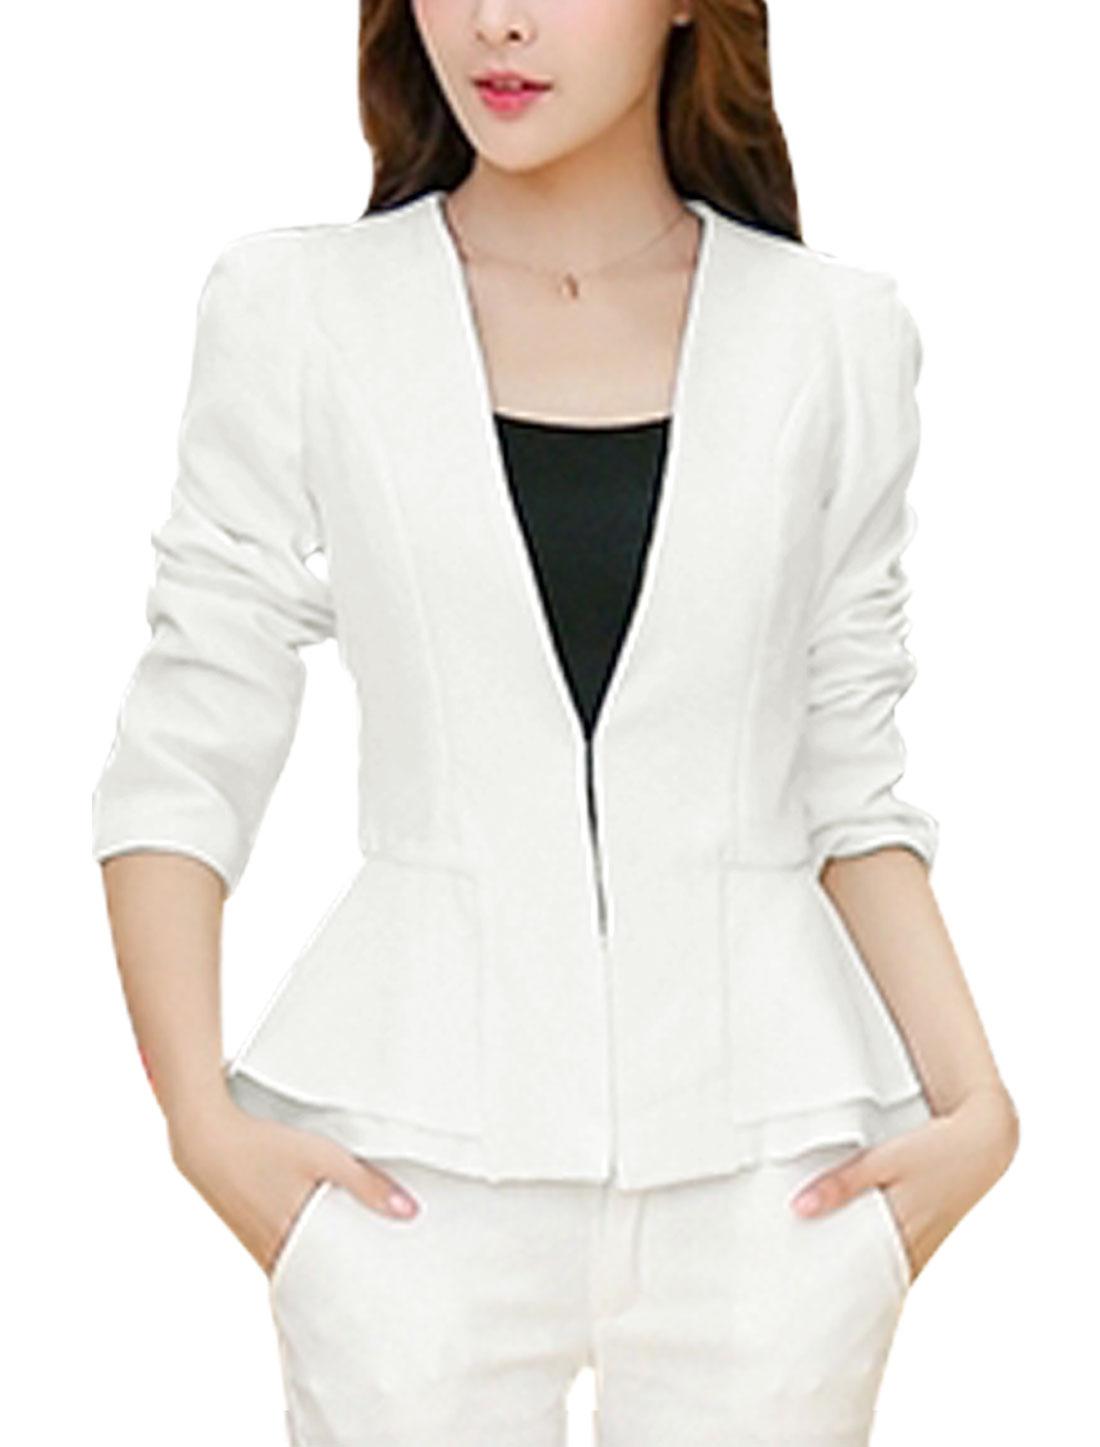 Women Hook Eye Closure Front Button Tab Back Peplum Blazer Jacket White M